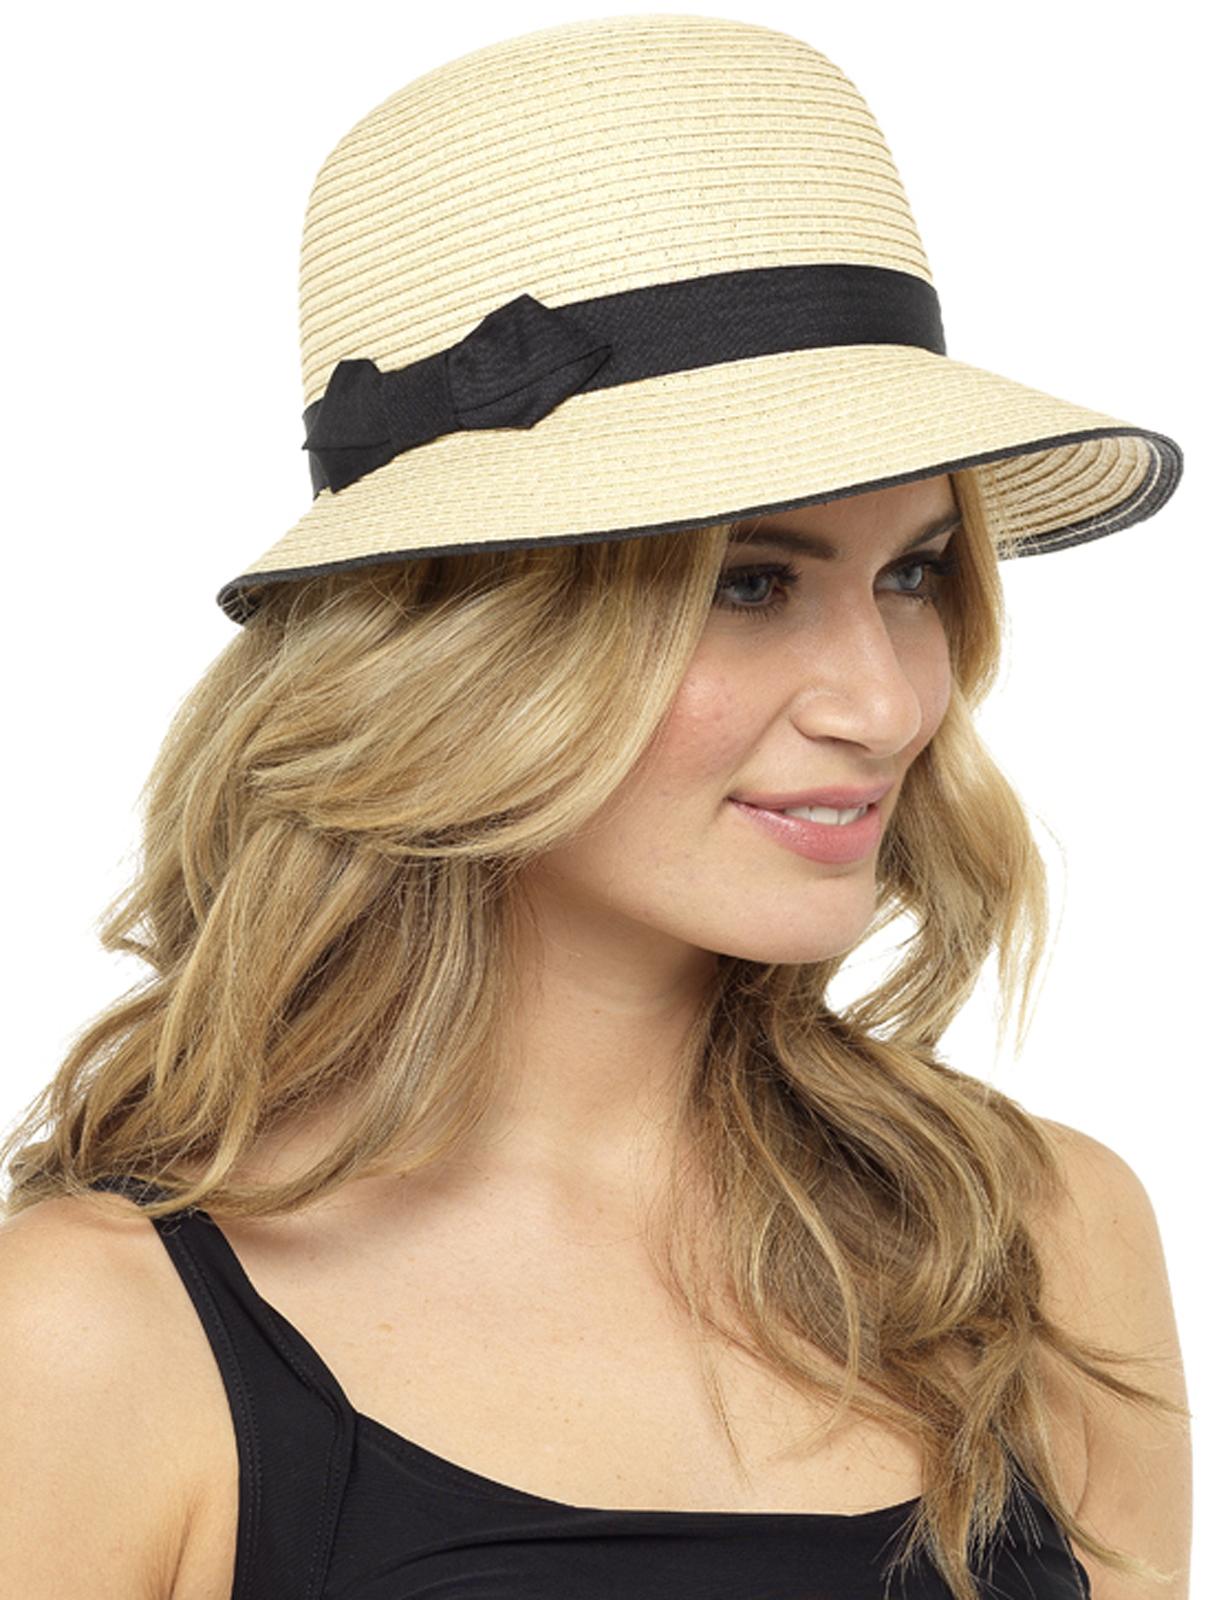 8ee8eb98 Ladies Narrow Brim Sun Hat Floppy Crushable Foldable Beach Summer ...